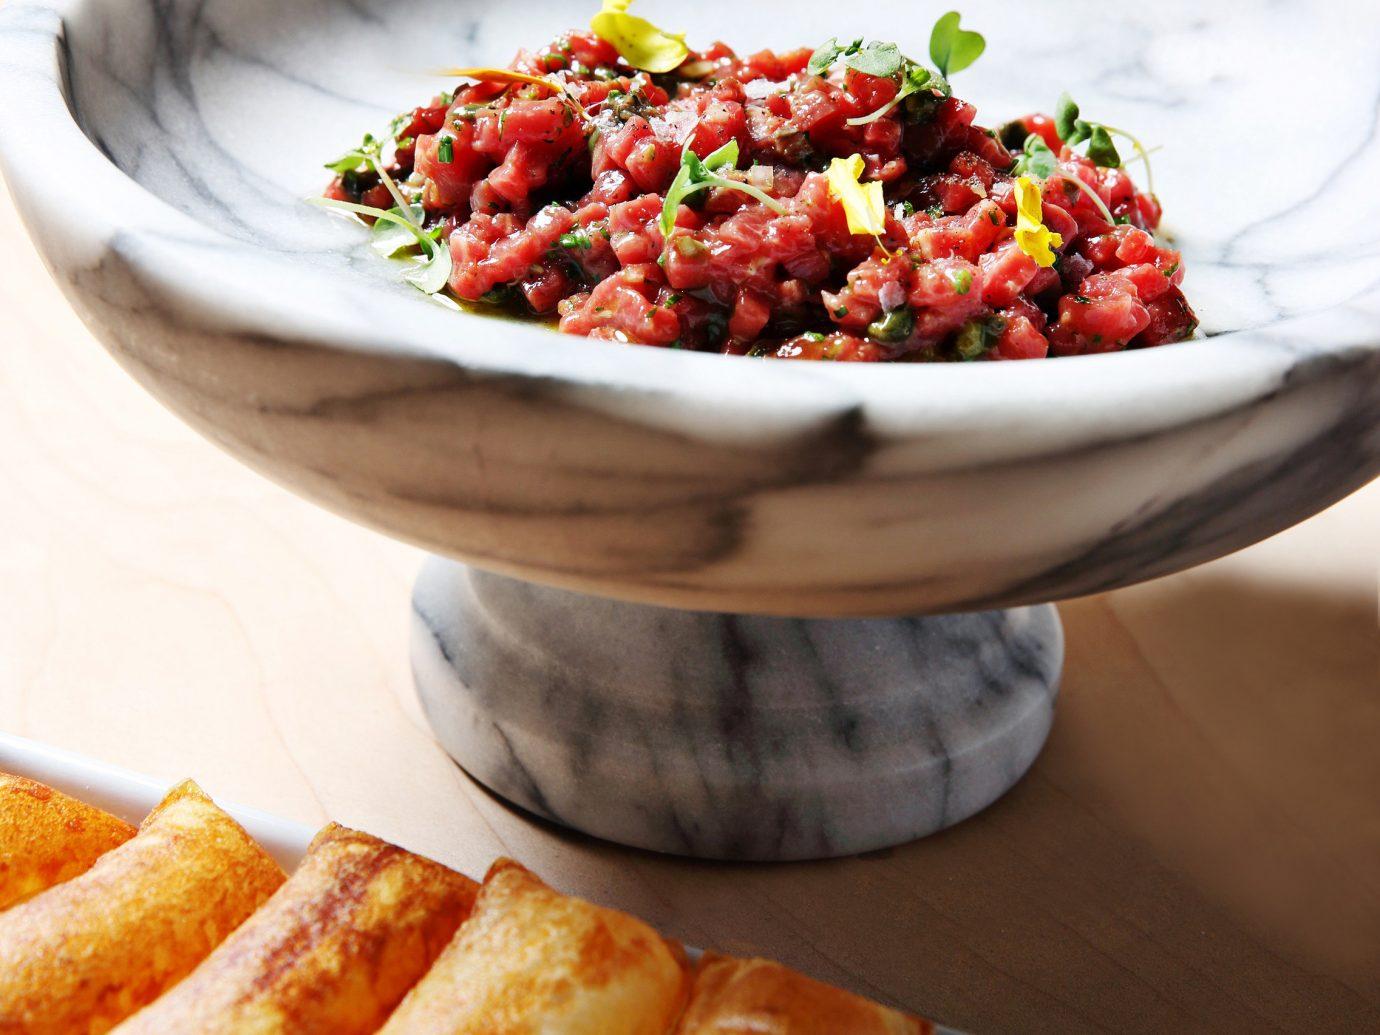 Trip Ideas food plate table dish produce cuisine vegetable breakfast meal asian food side dish sliced